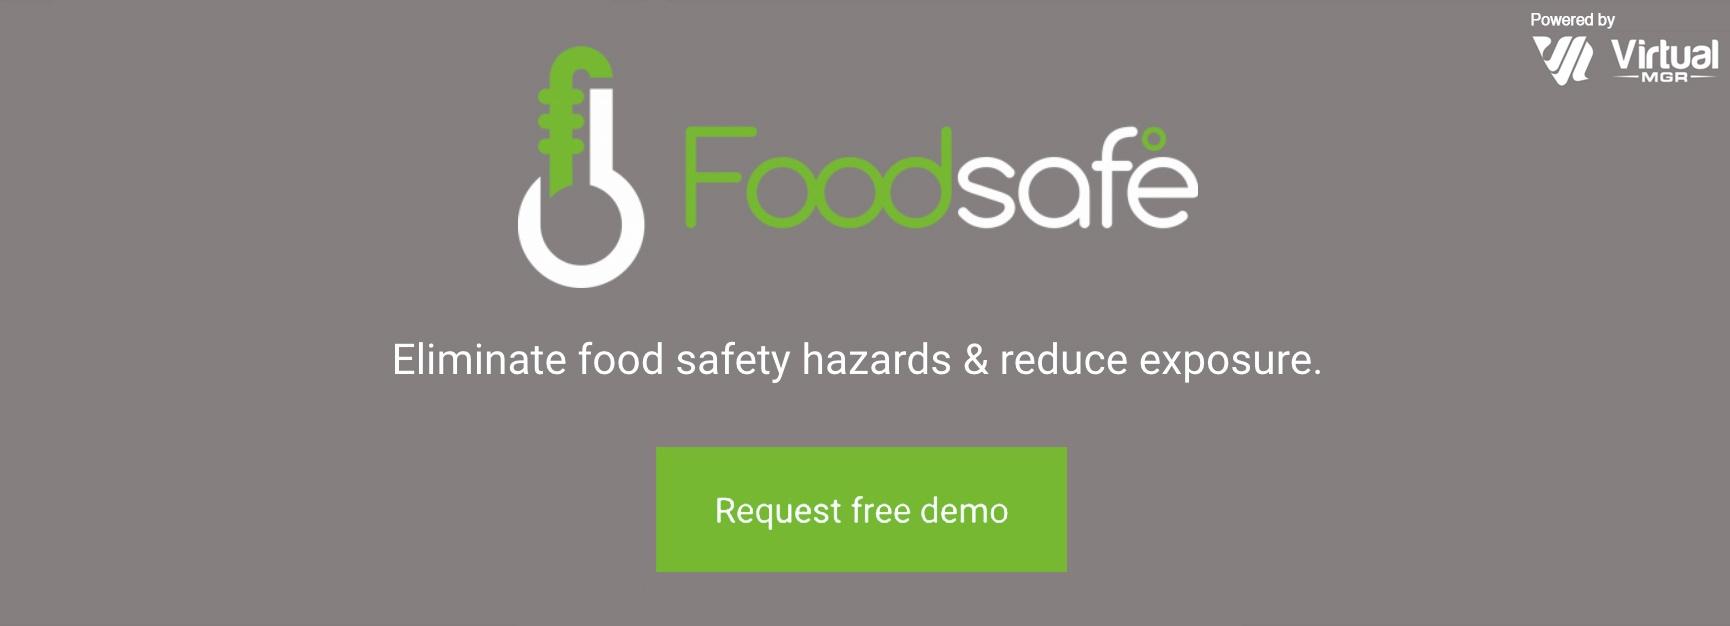 FoodSafe_Banner3.jpg